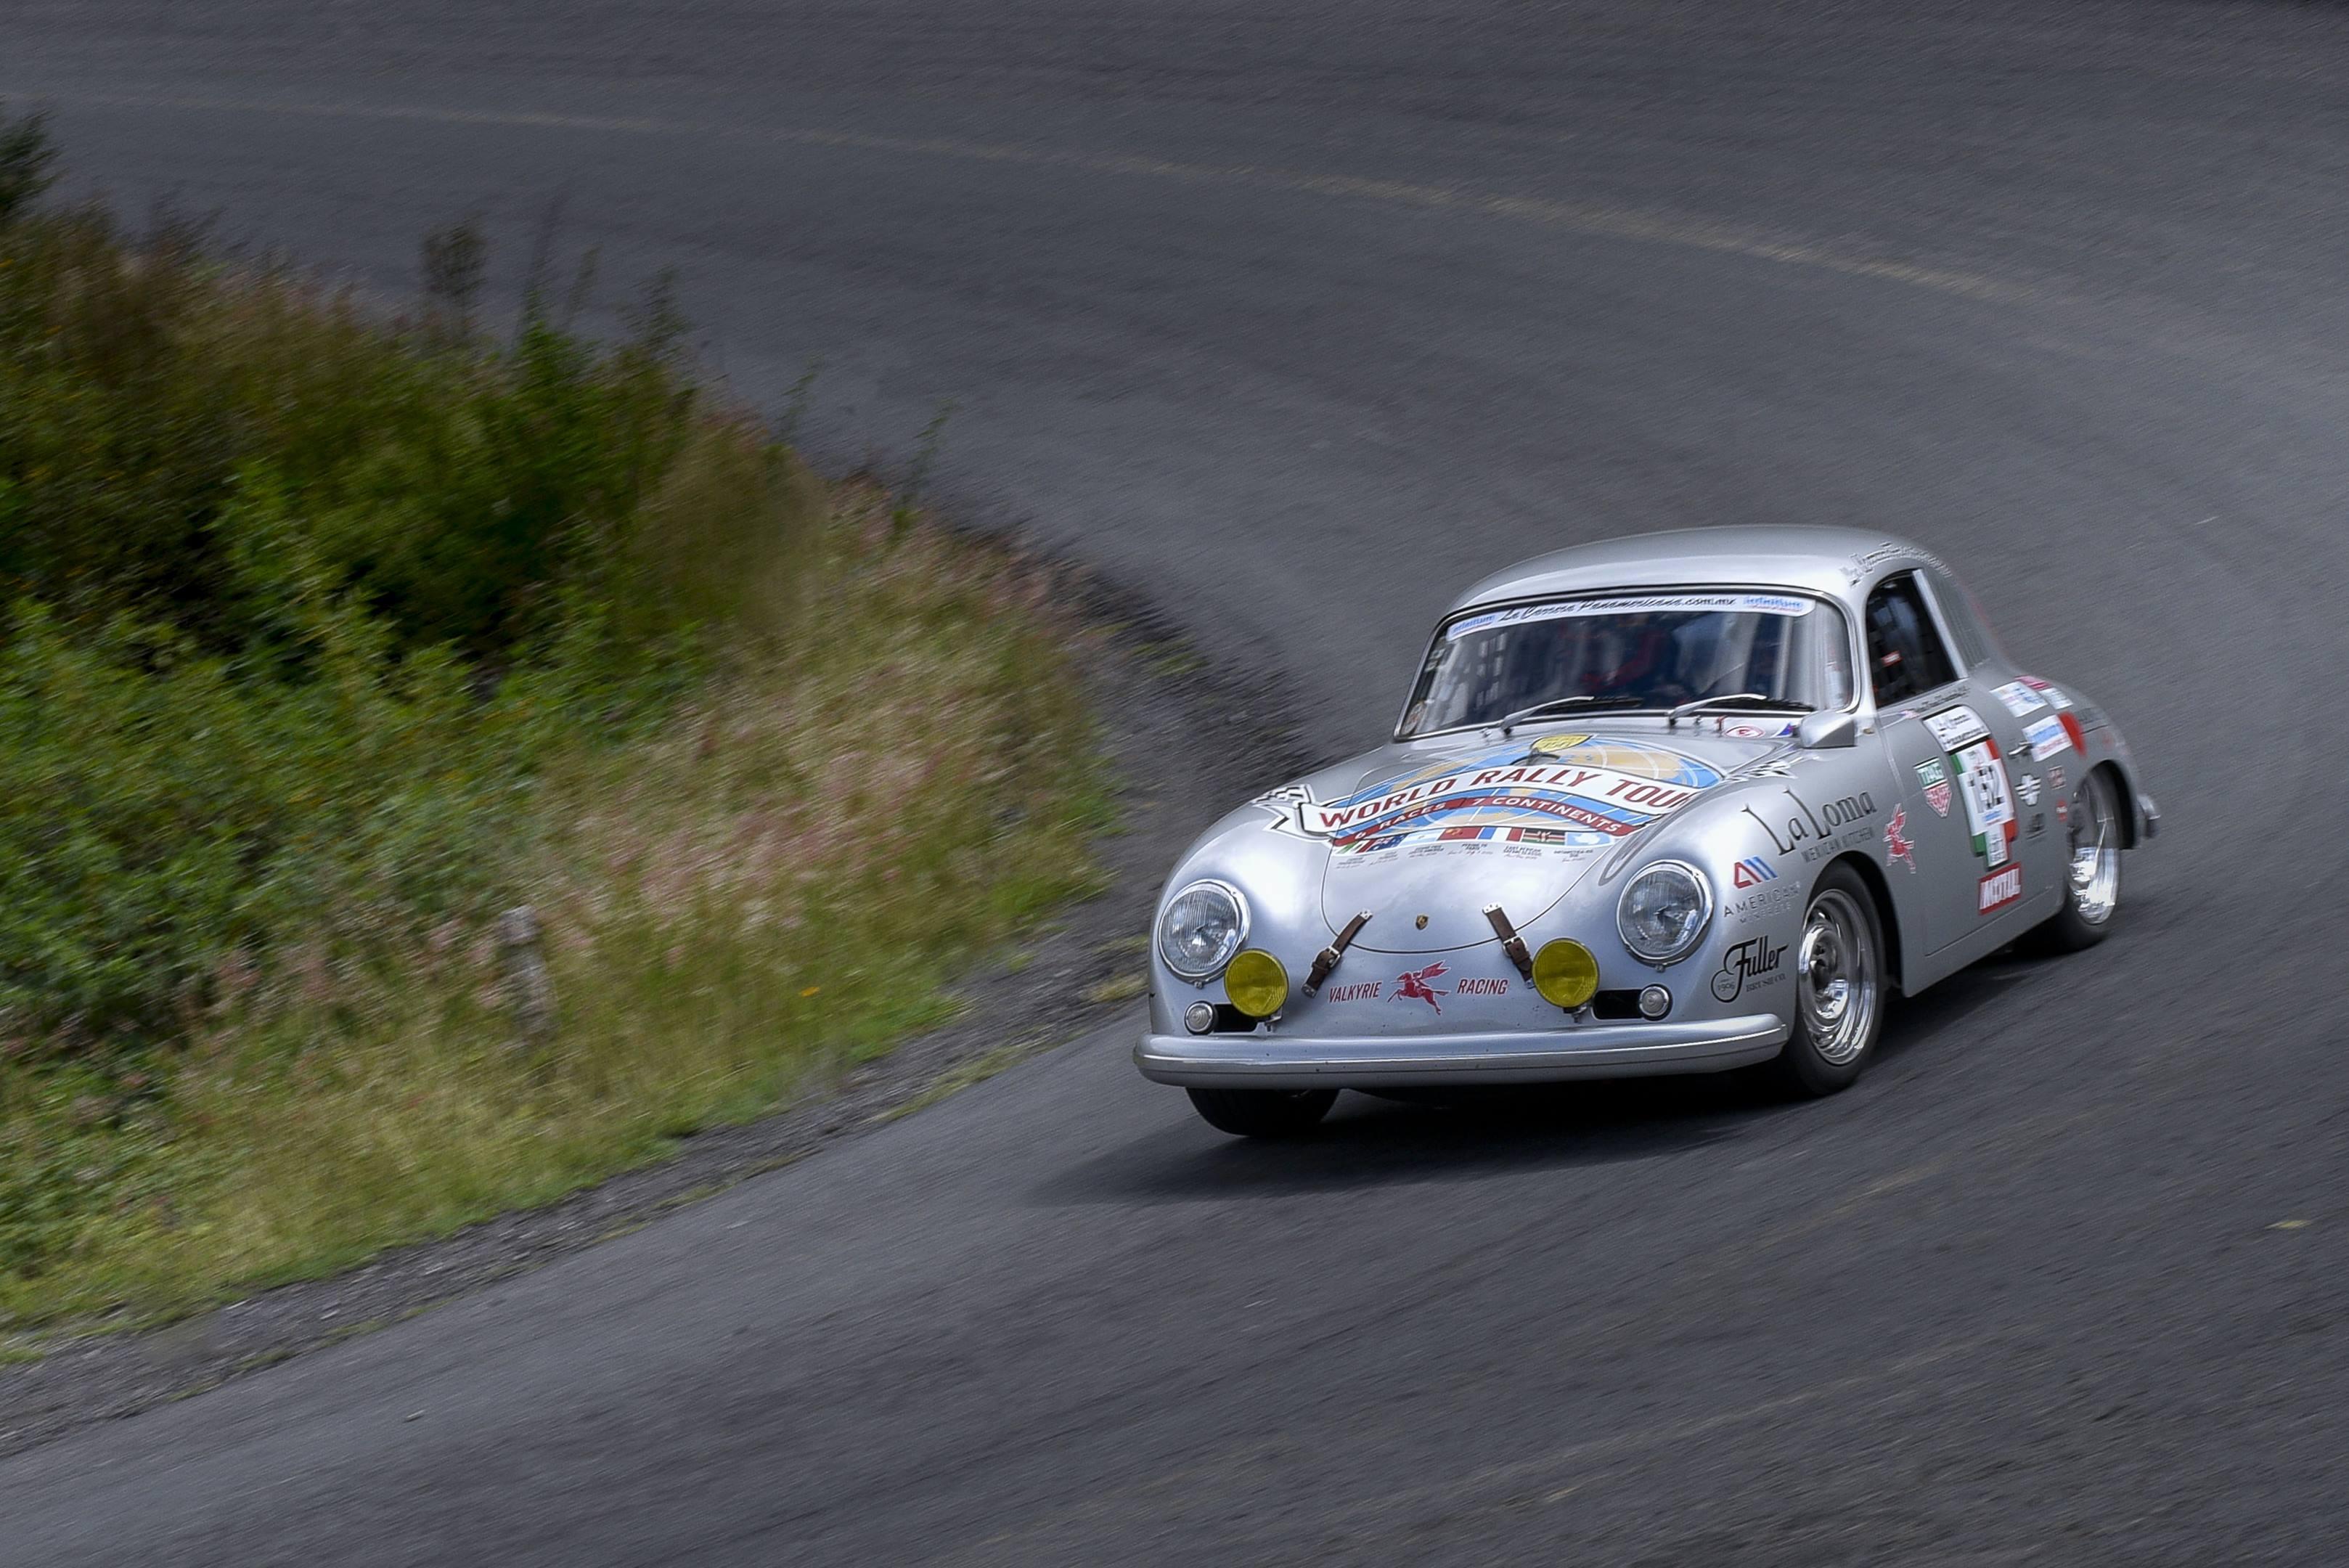 Renée Brinkerhoff hurls her 1956 Porsche 356 into a curve in La Carrera Panamericana 2017.